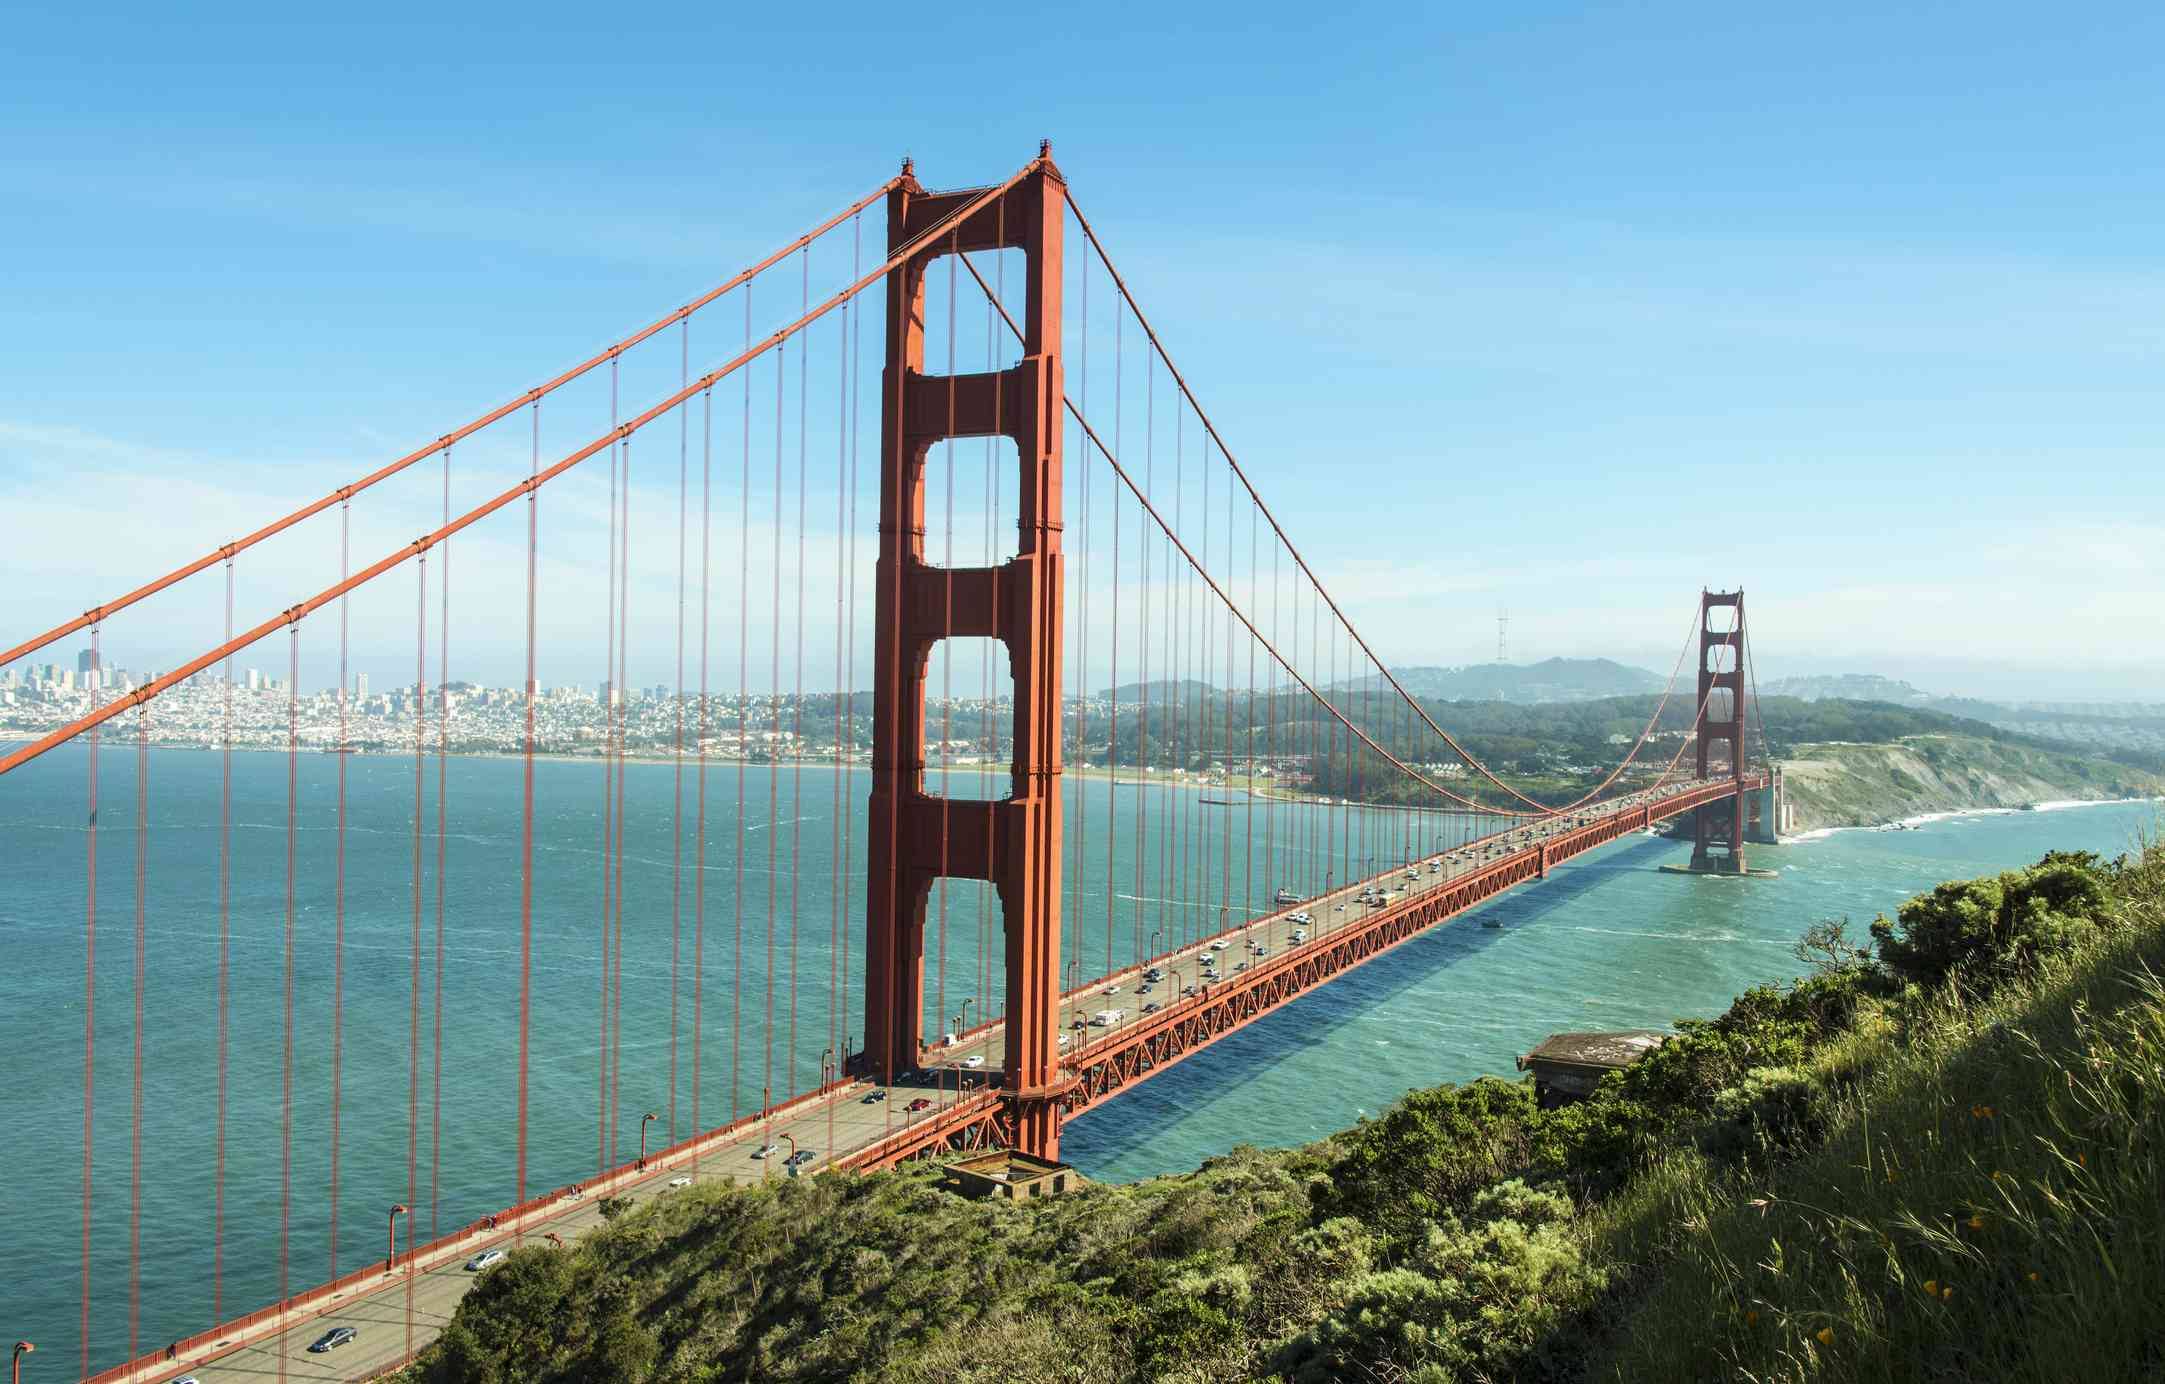 Golden Gate Bridge on a Sunny Day